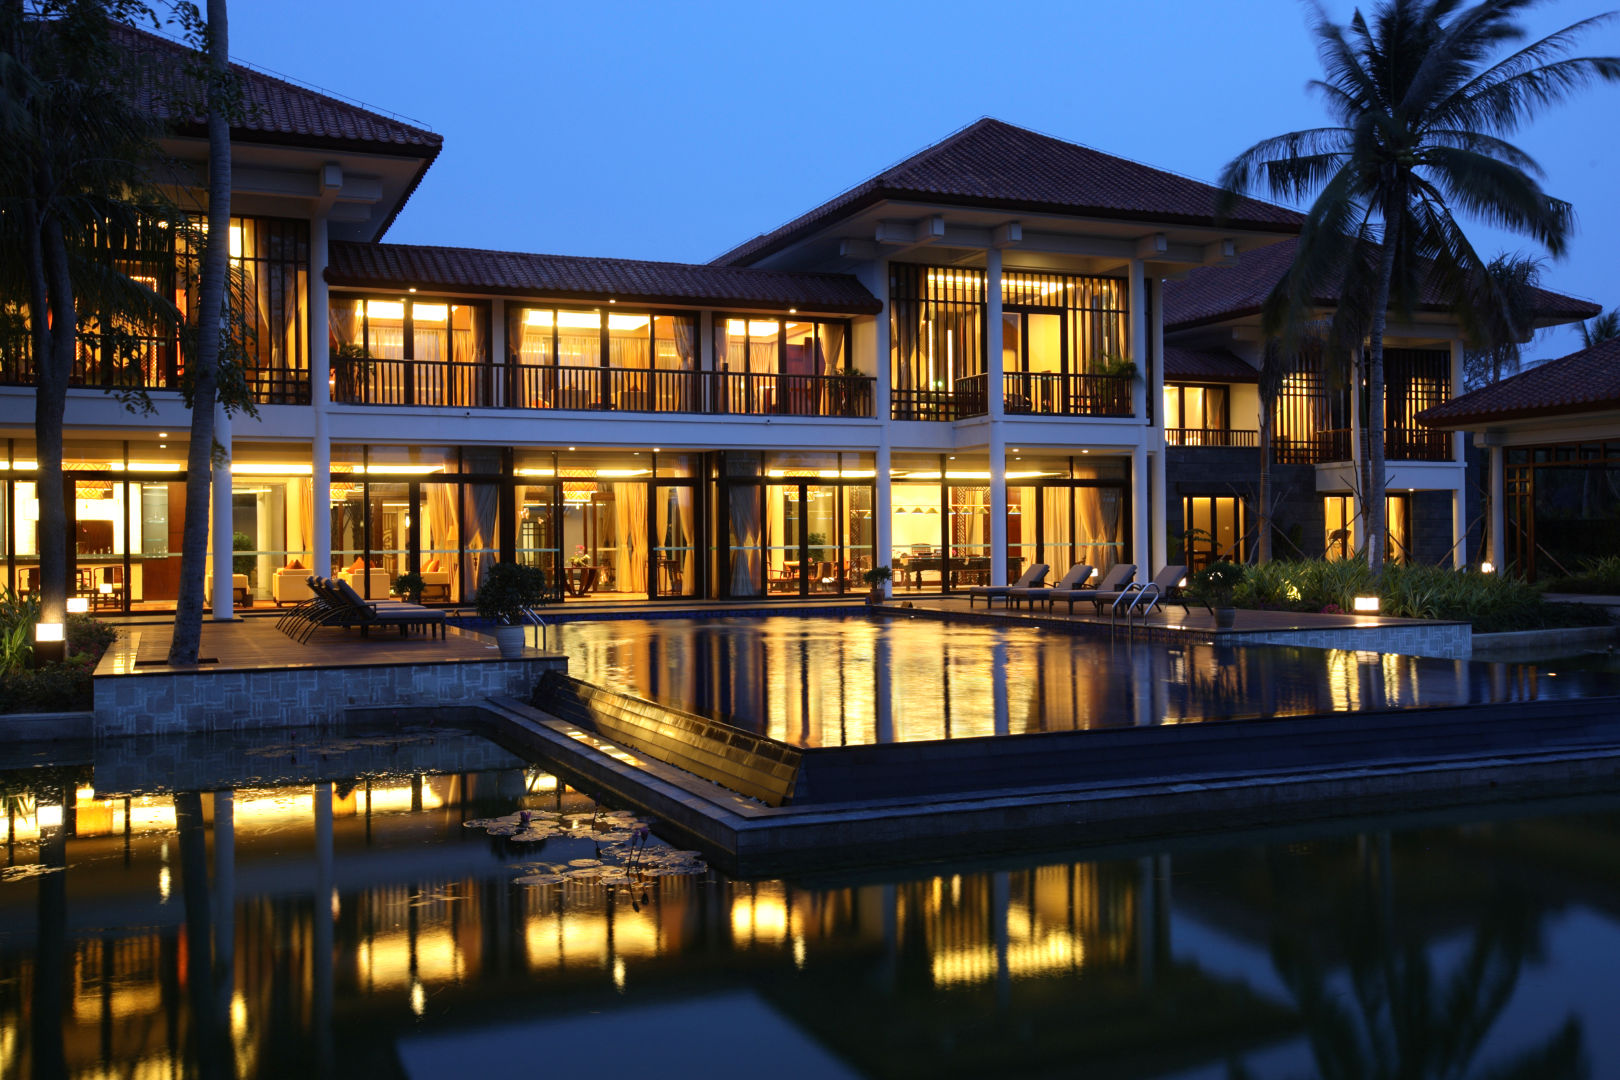 Banyan Tree Sanya Resort 5* lux - Luhuitou Bay